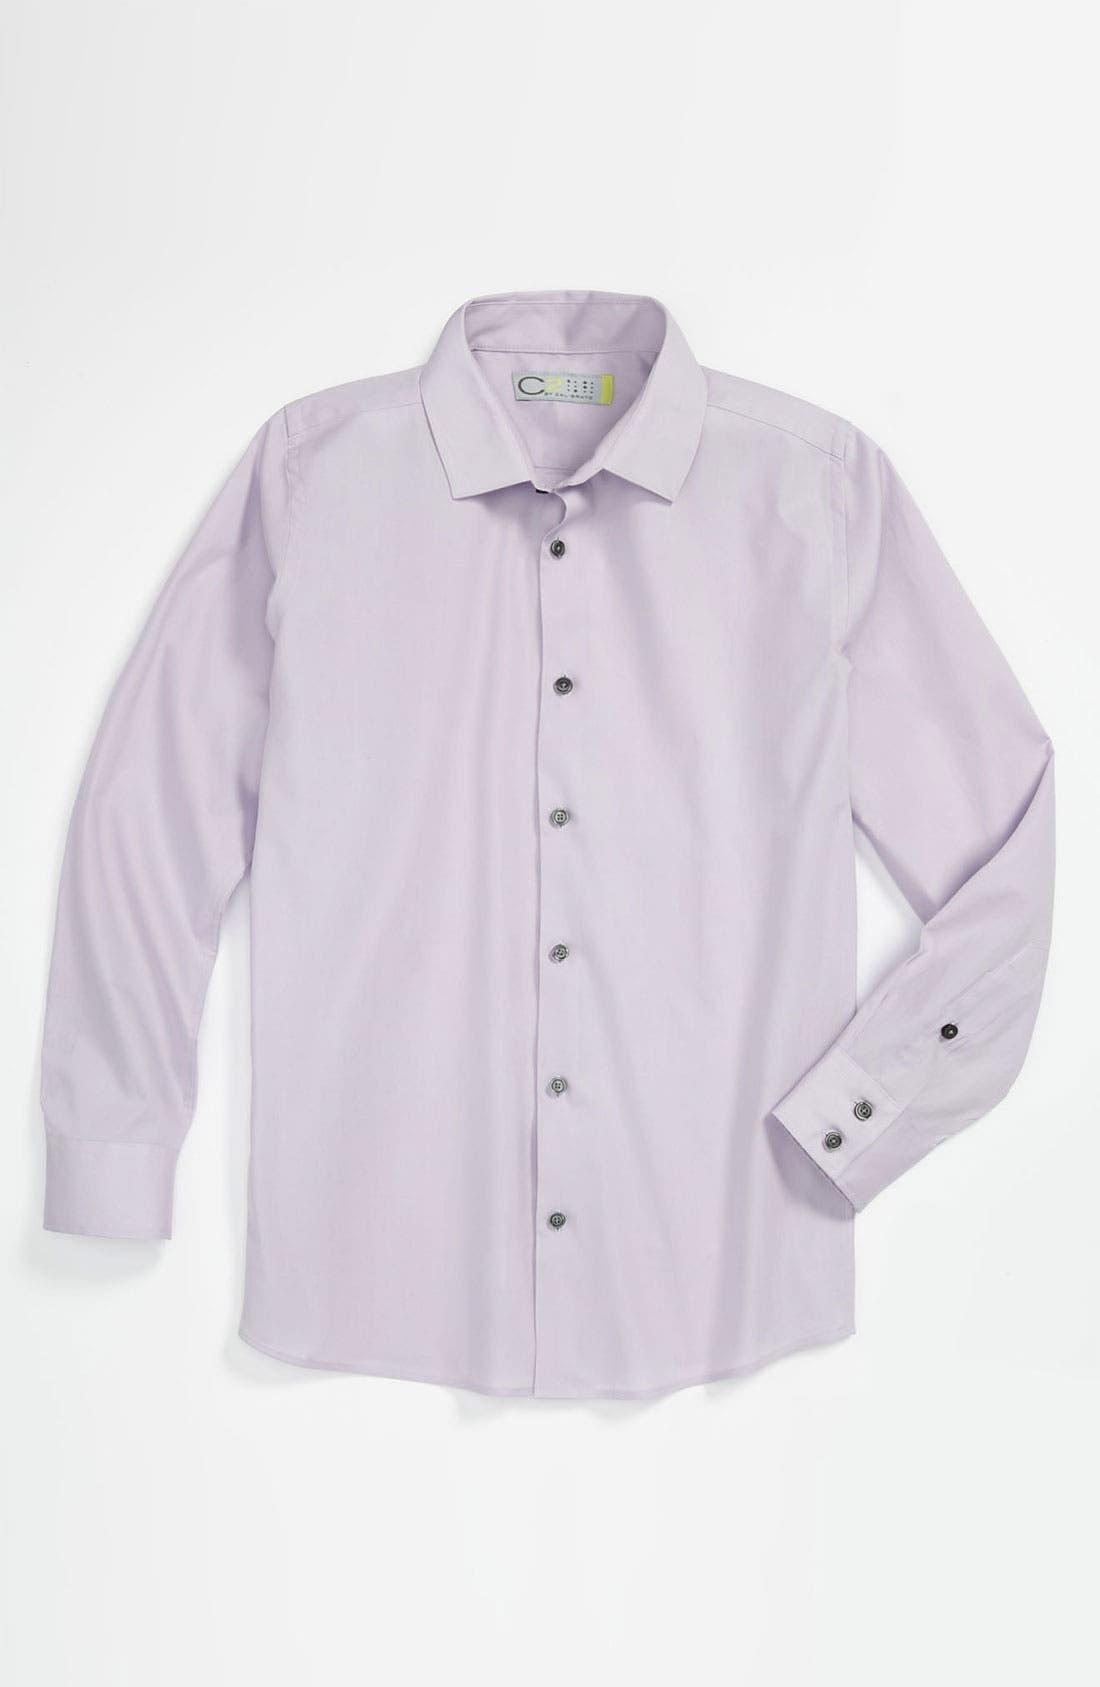 Main Image - C2 by Calibrate 'Carter' Dress Shirt (Little Boys)